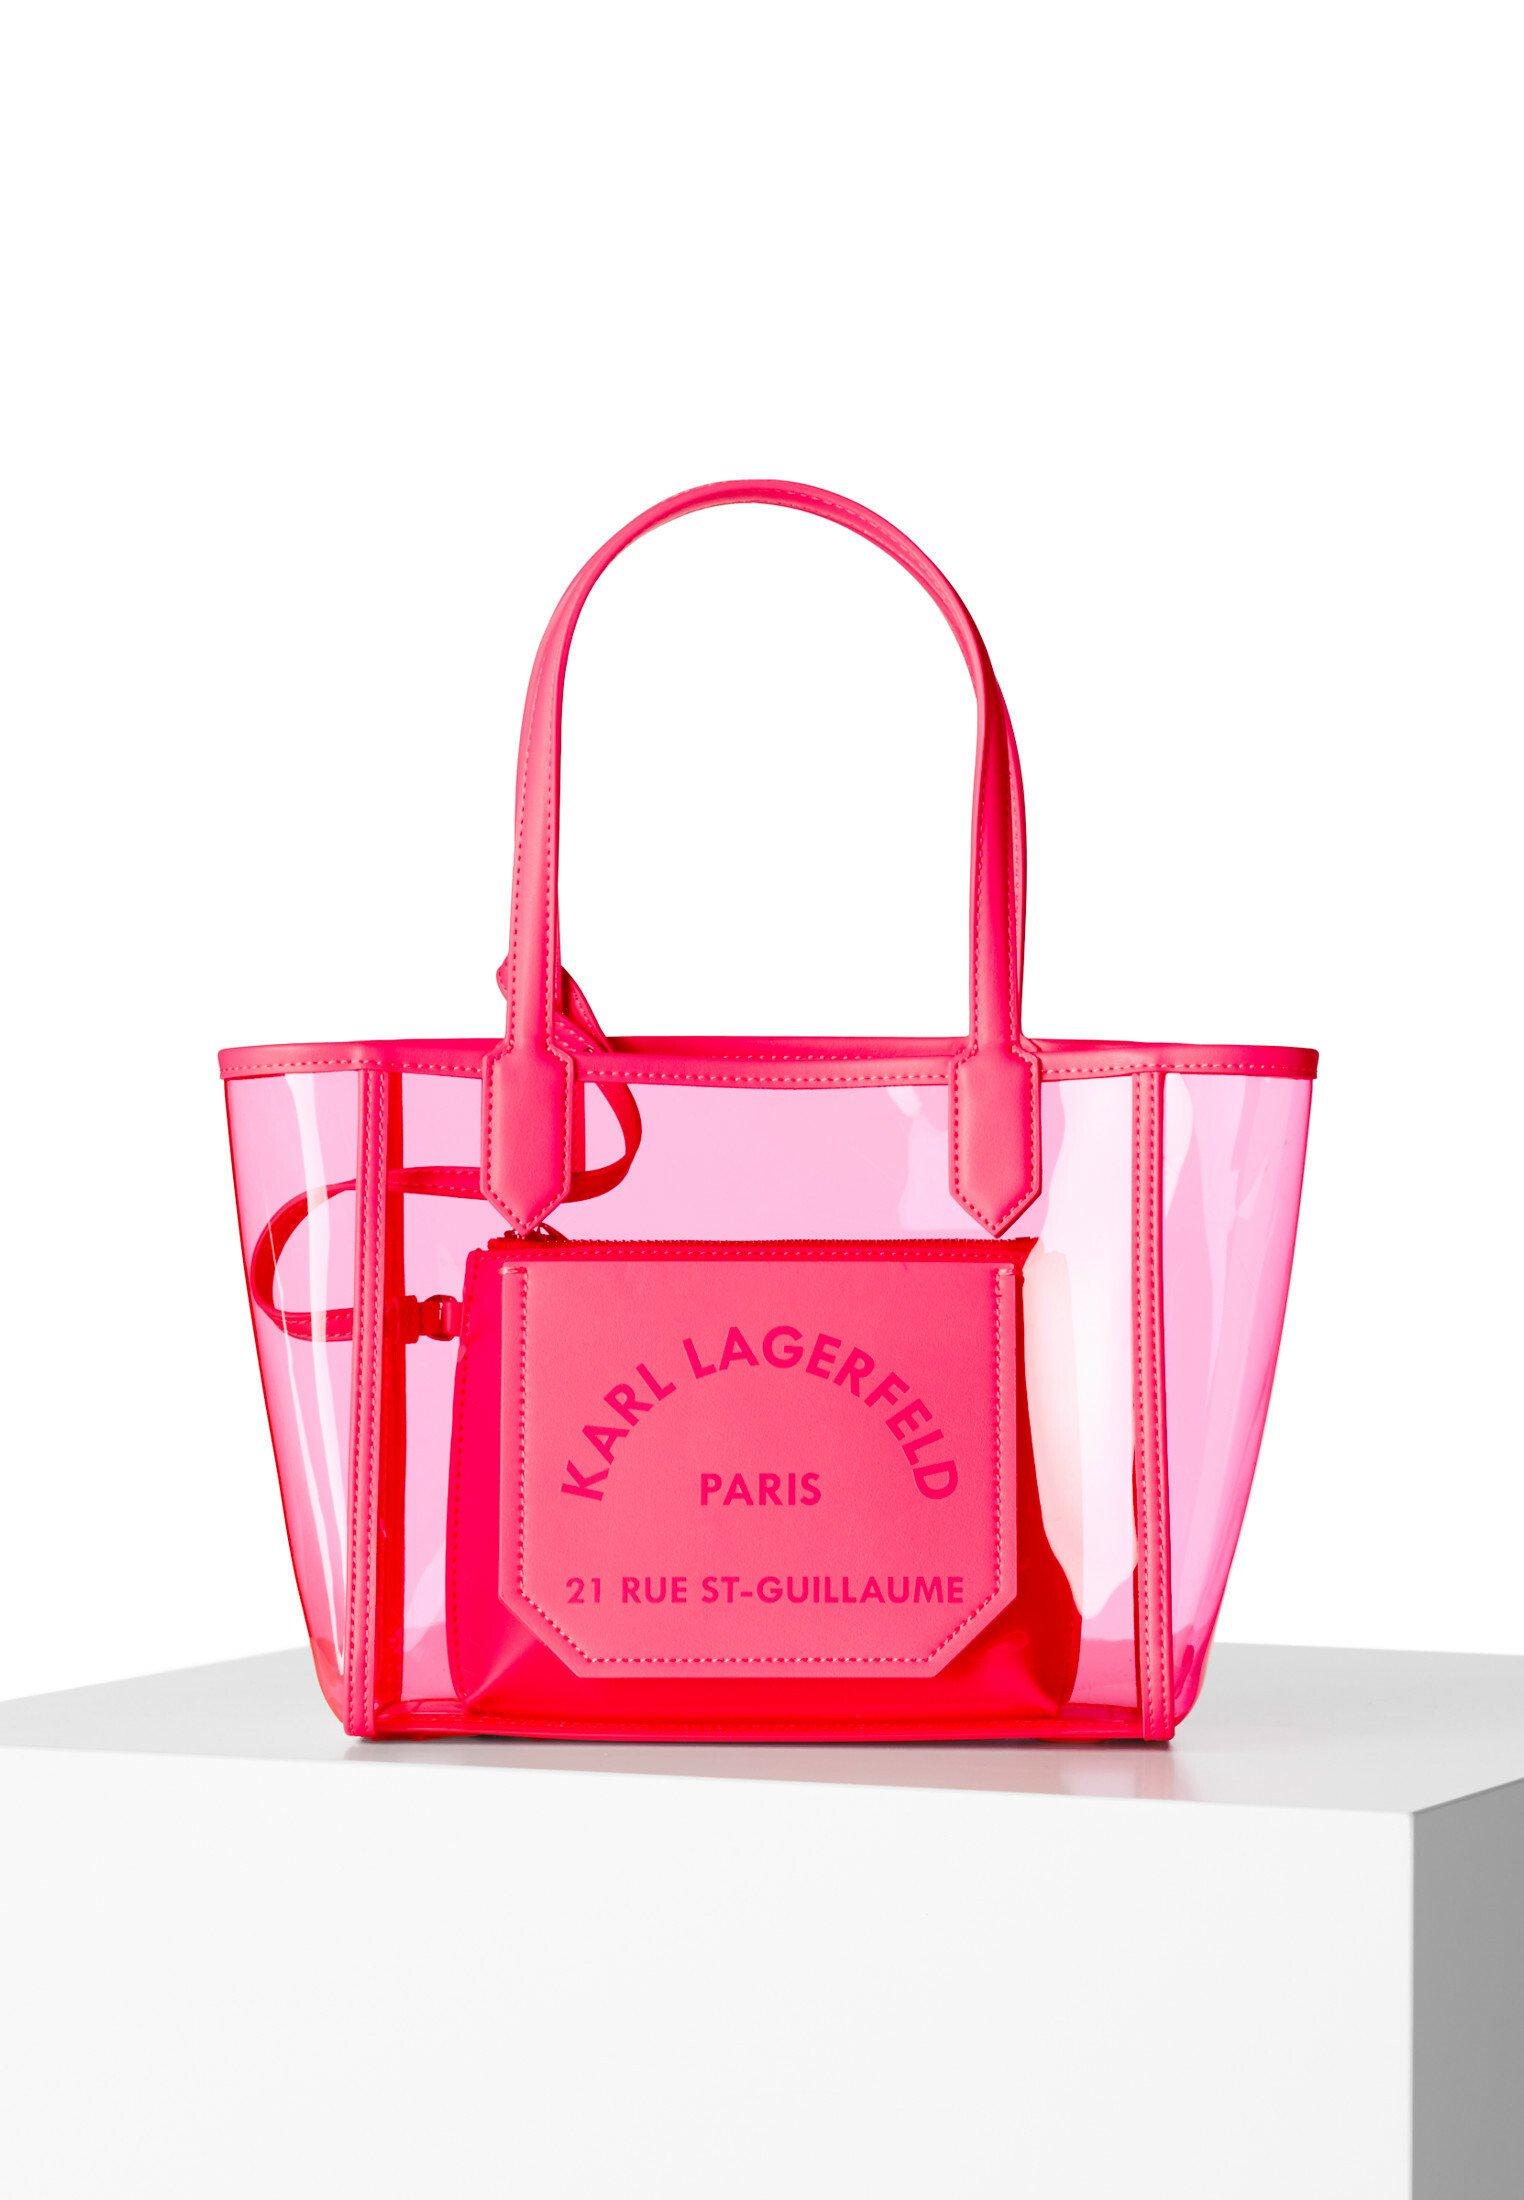 KARL LAGERFELD JOURNEY - Tote bag - pink